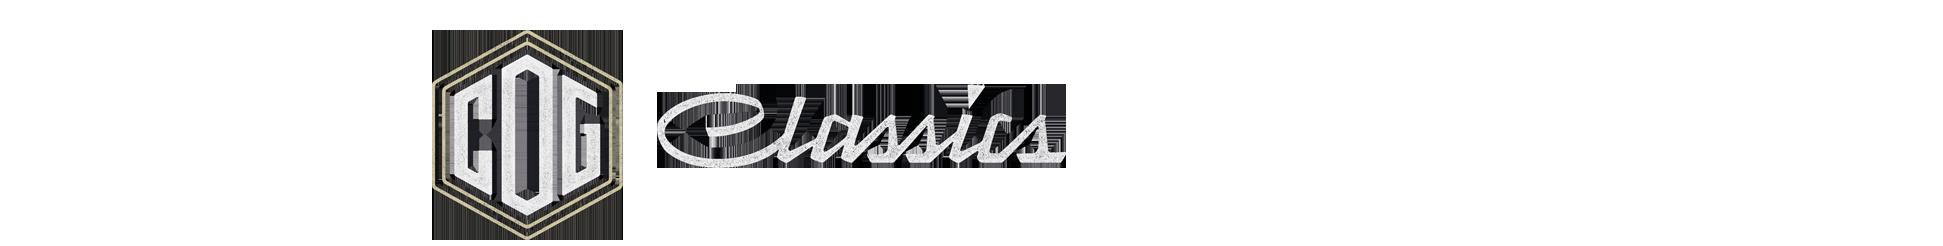 C.O.G. Classics